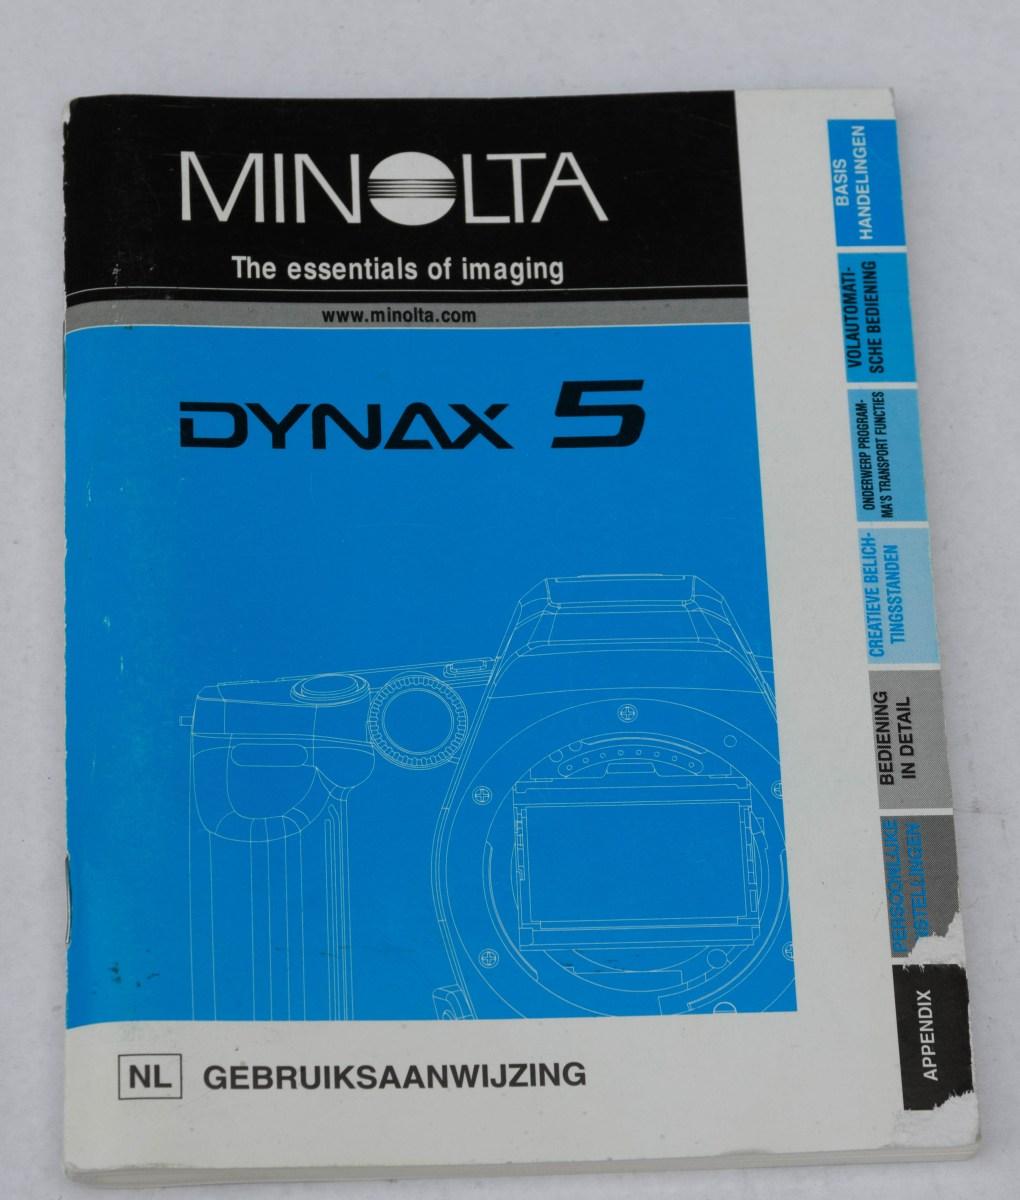 Minolta Dynax 5 - handleiding